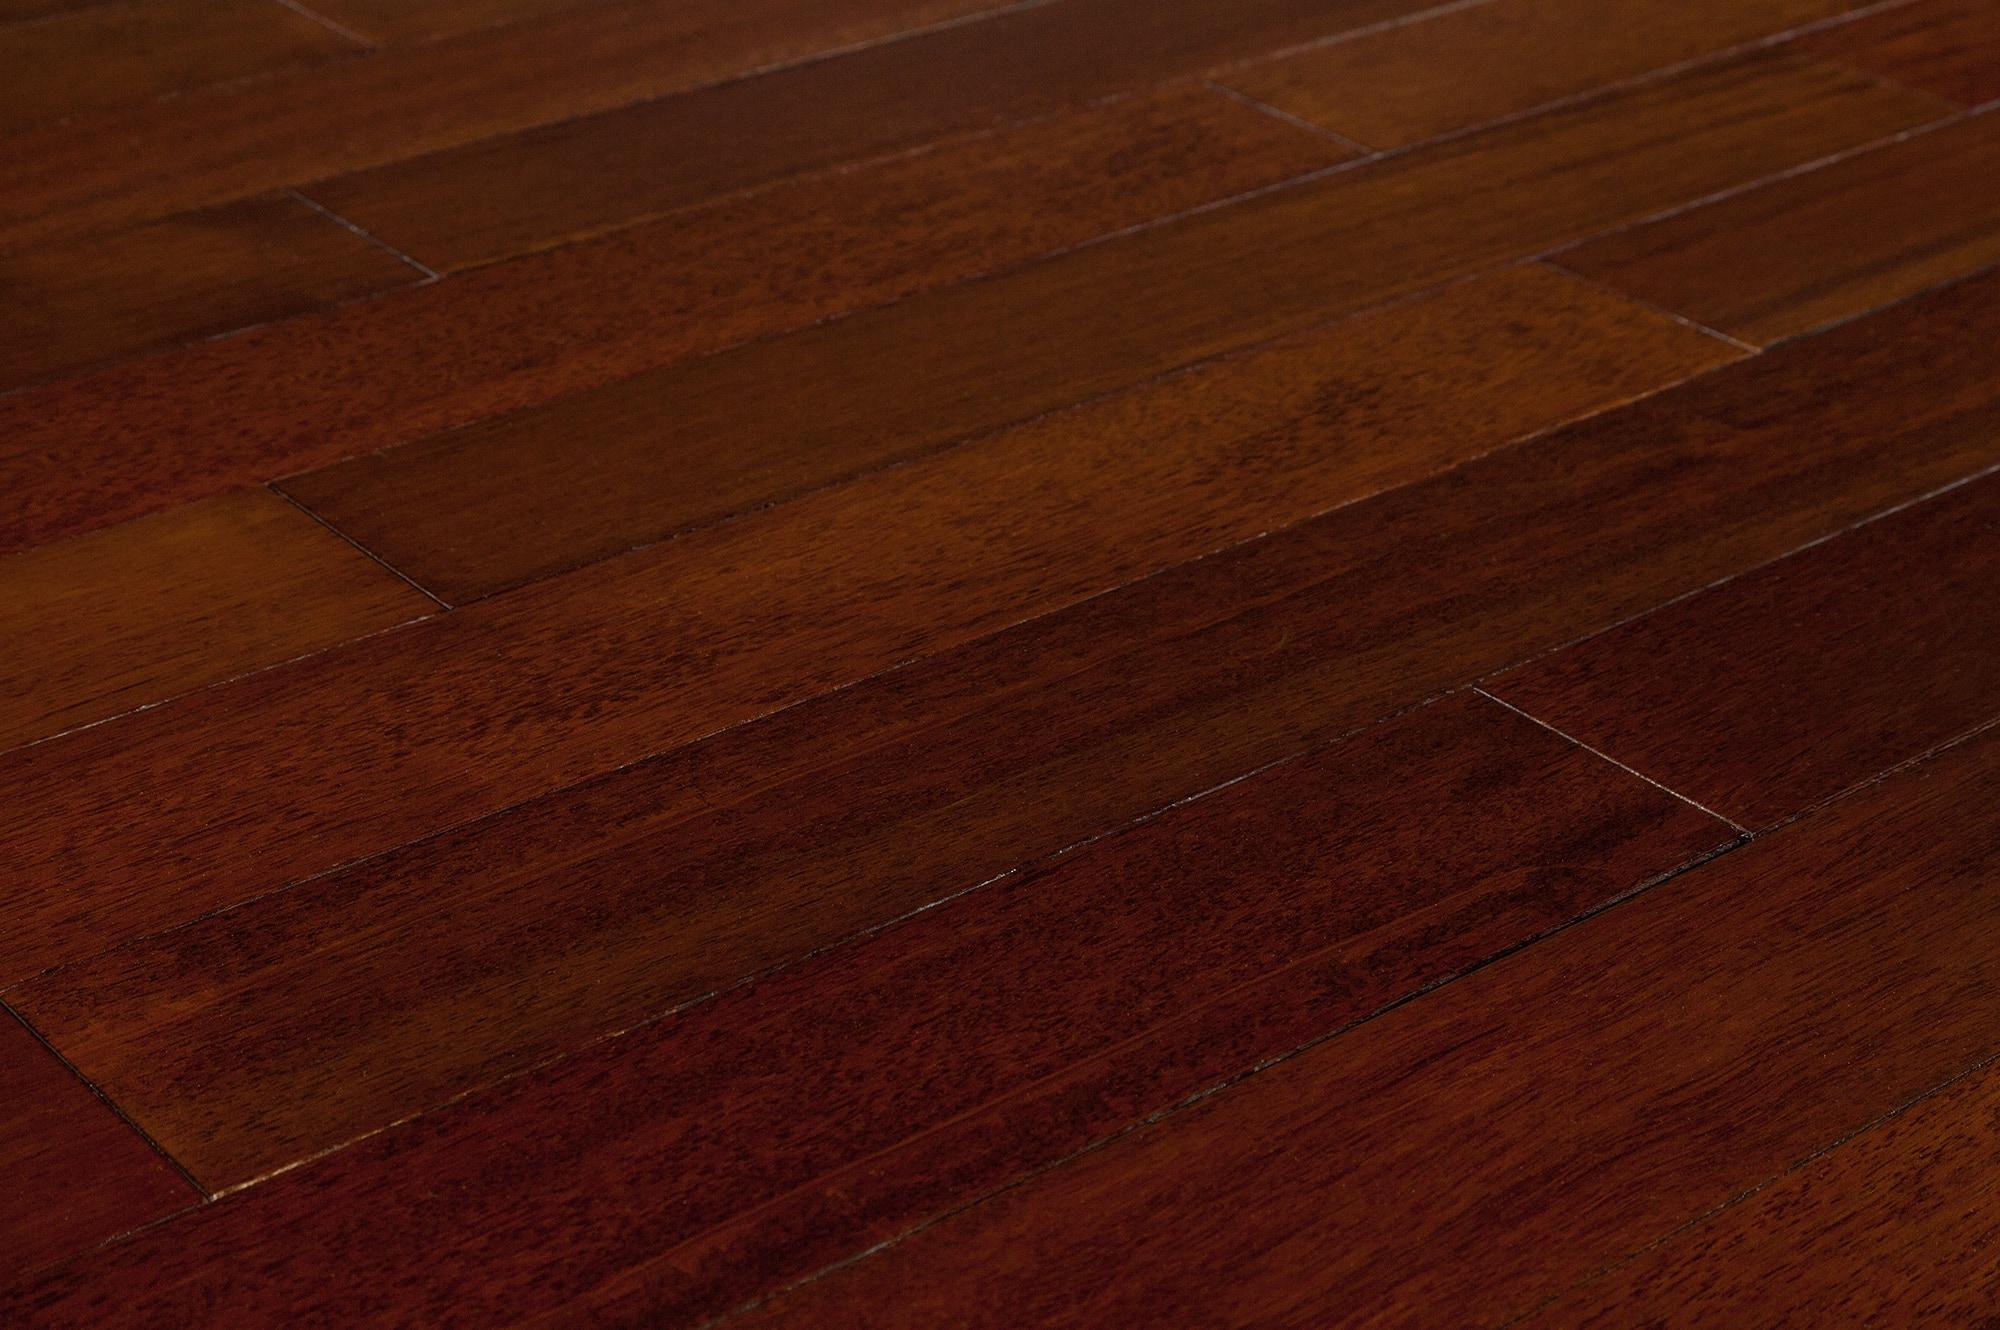 Mazama hardwood wide plank kempas collection royal for Kempas hardwood flooring